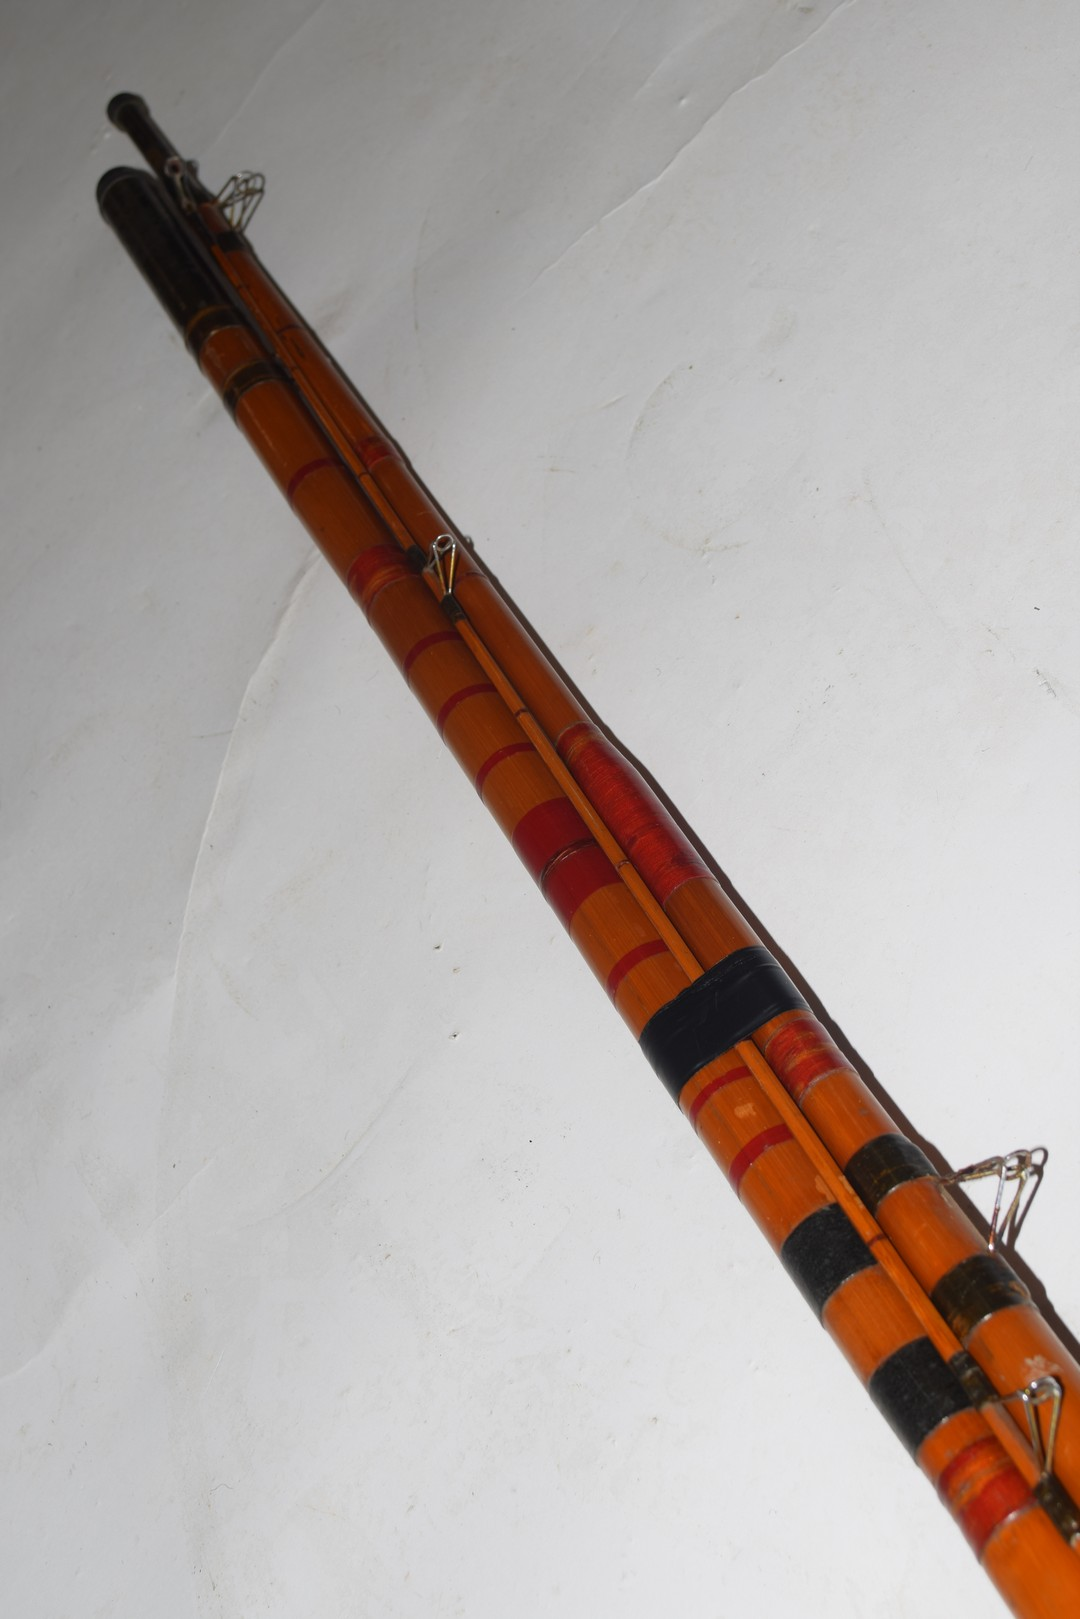 Vintage three-piece cane fishing rod - Image 4 of 4